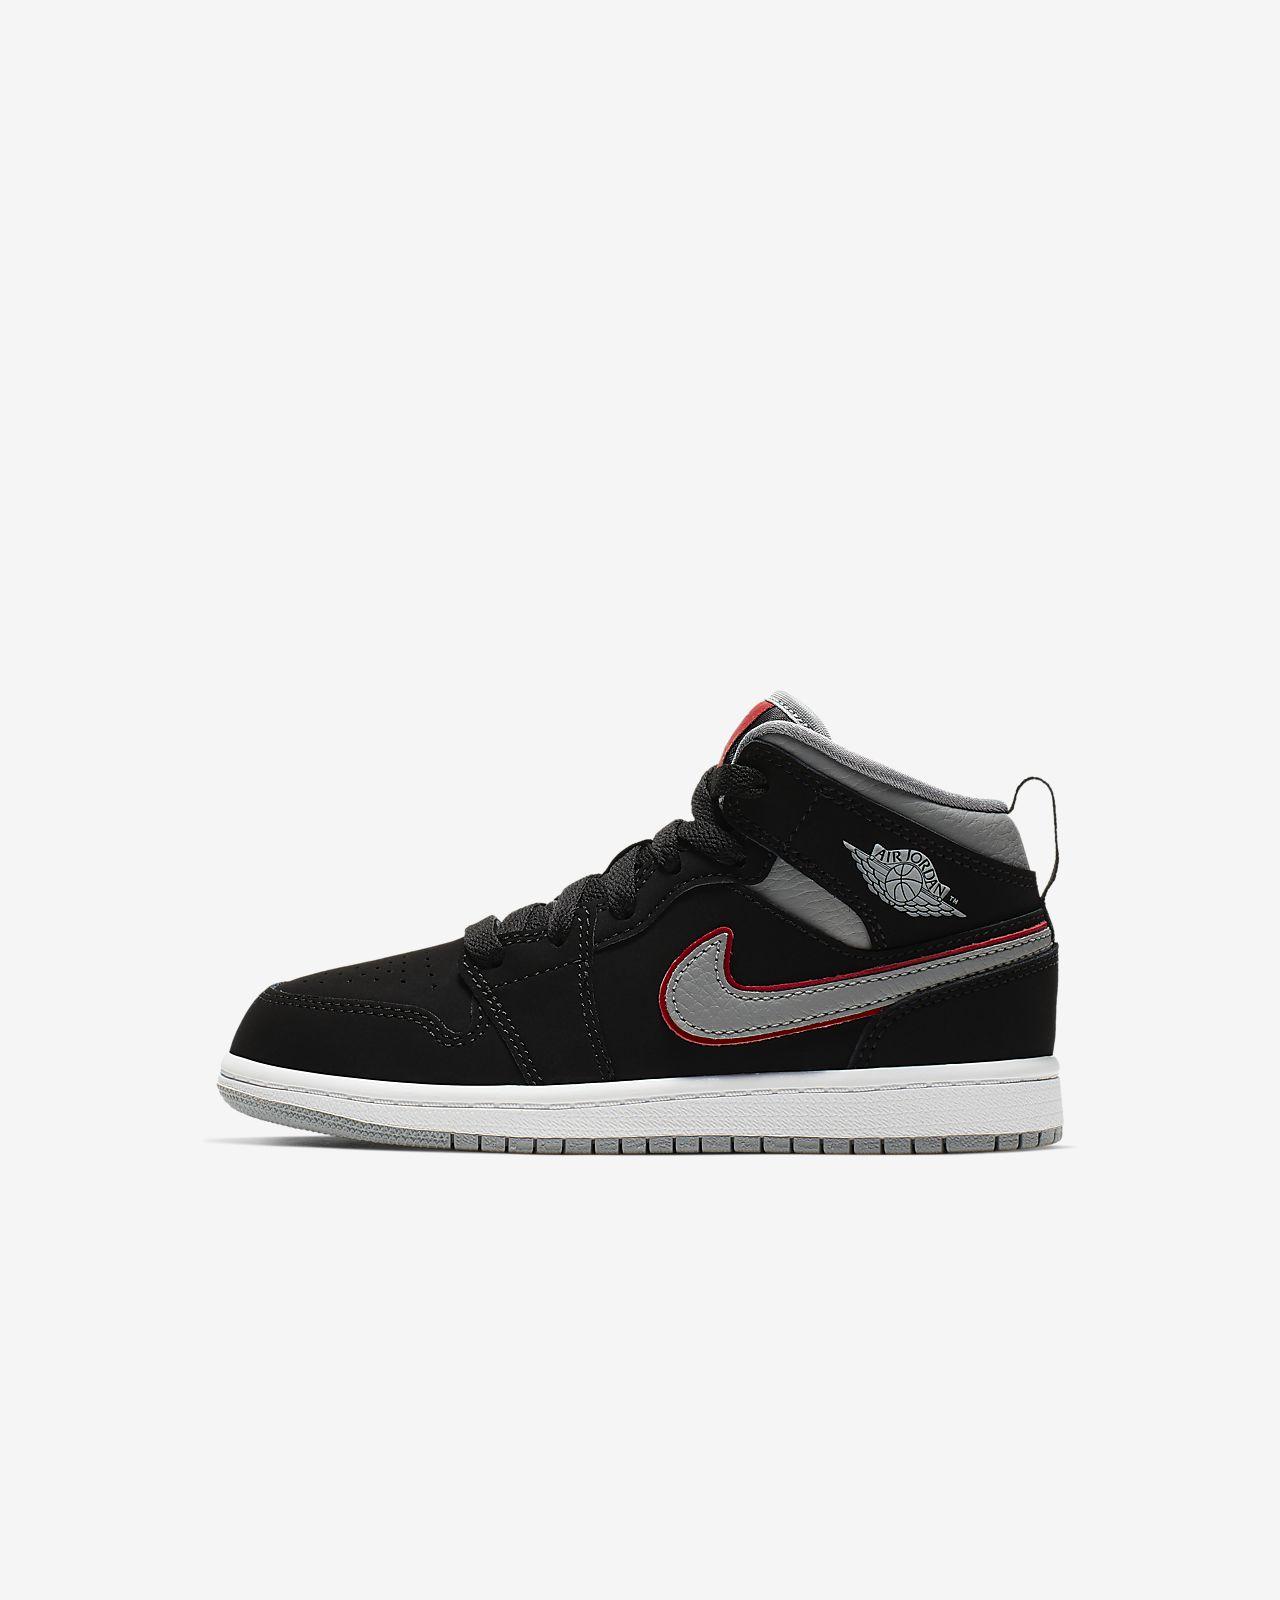 huge discount d3066 11a58 ... Air Jordan 1 Mid Schuh für jüngere Kinder